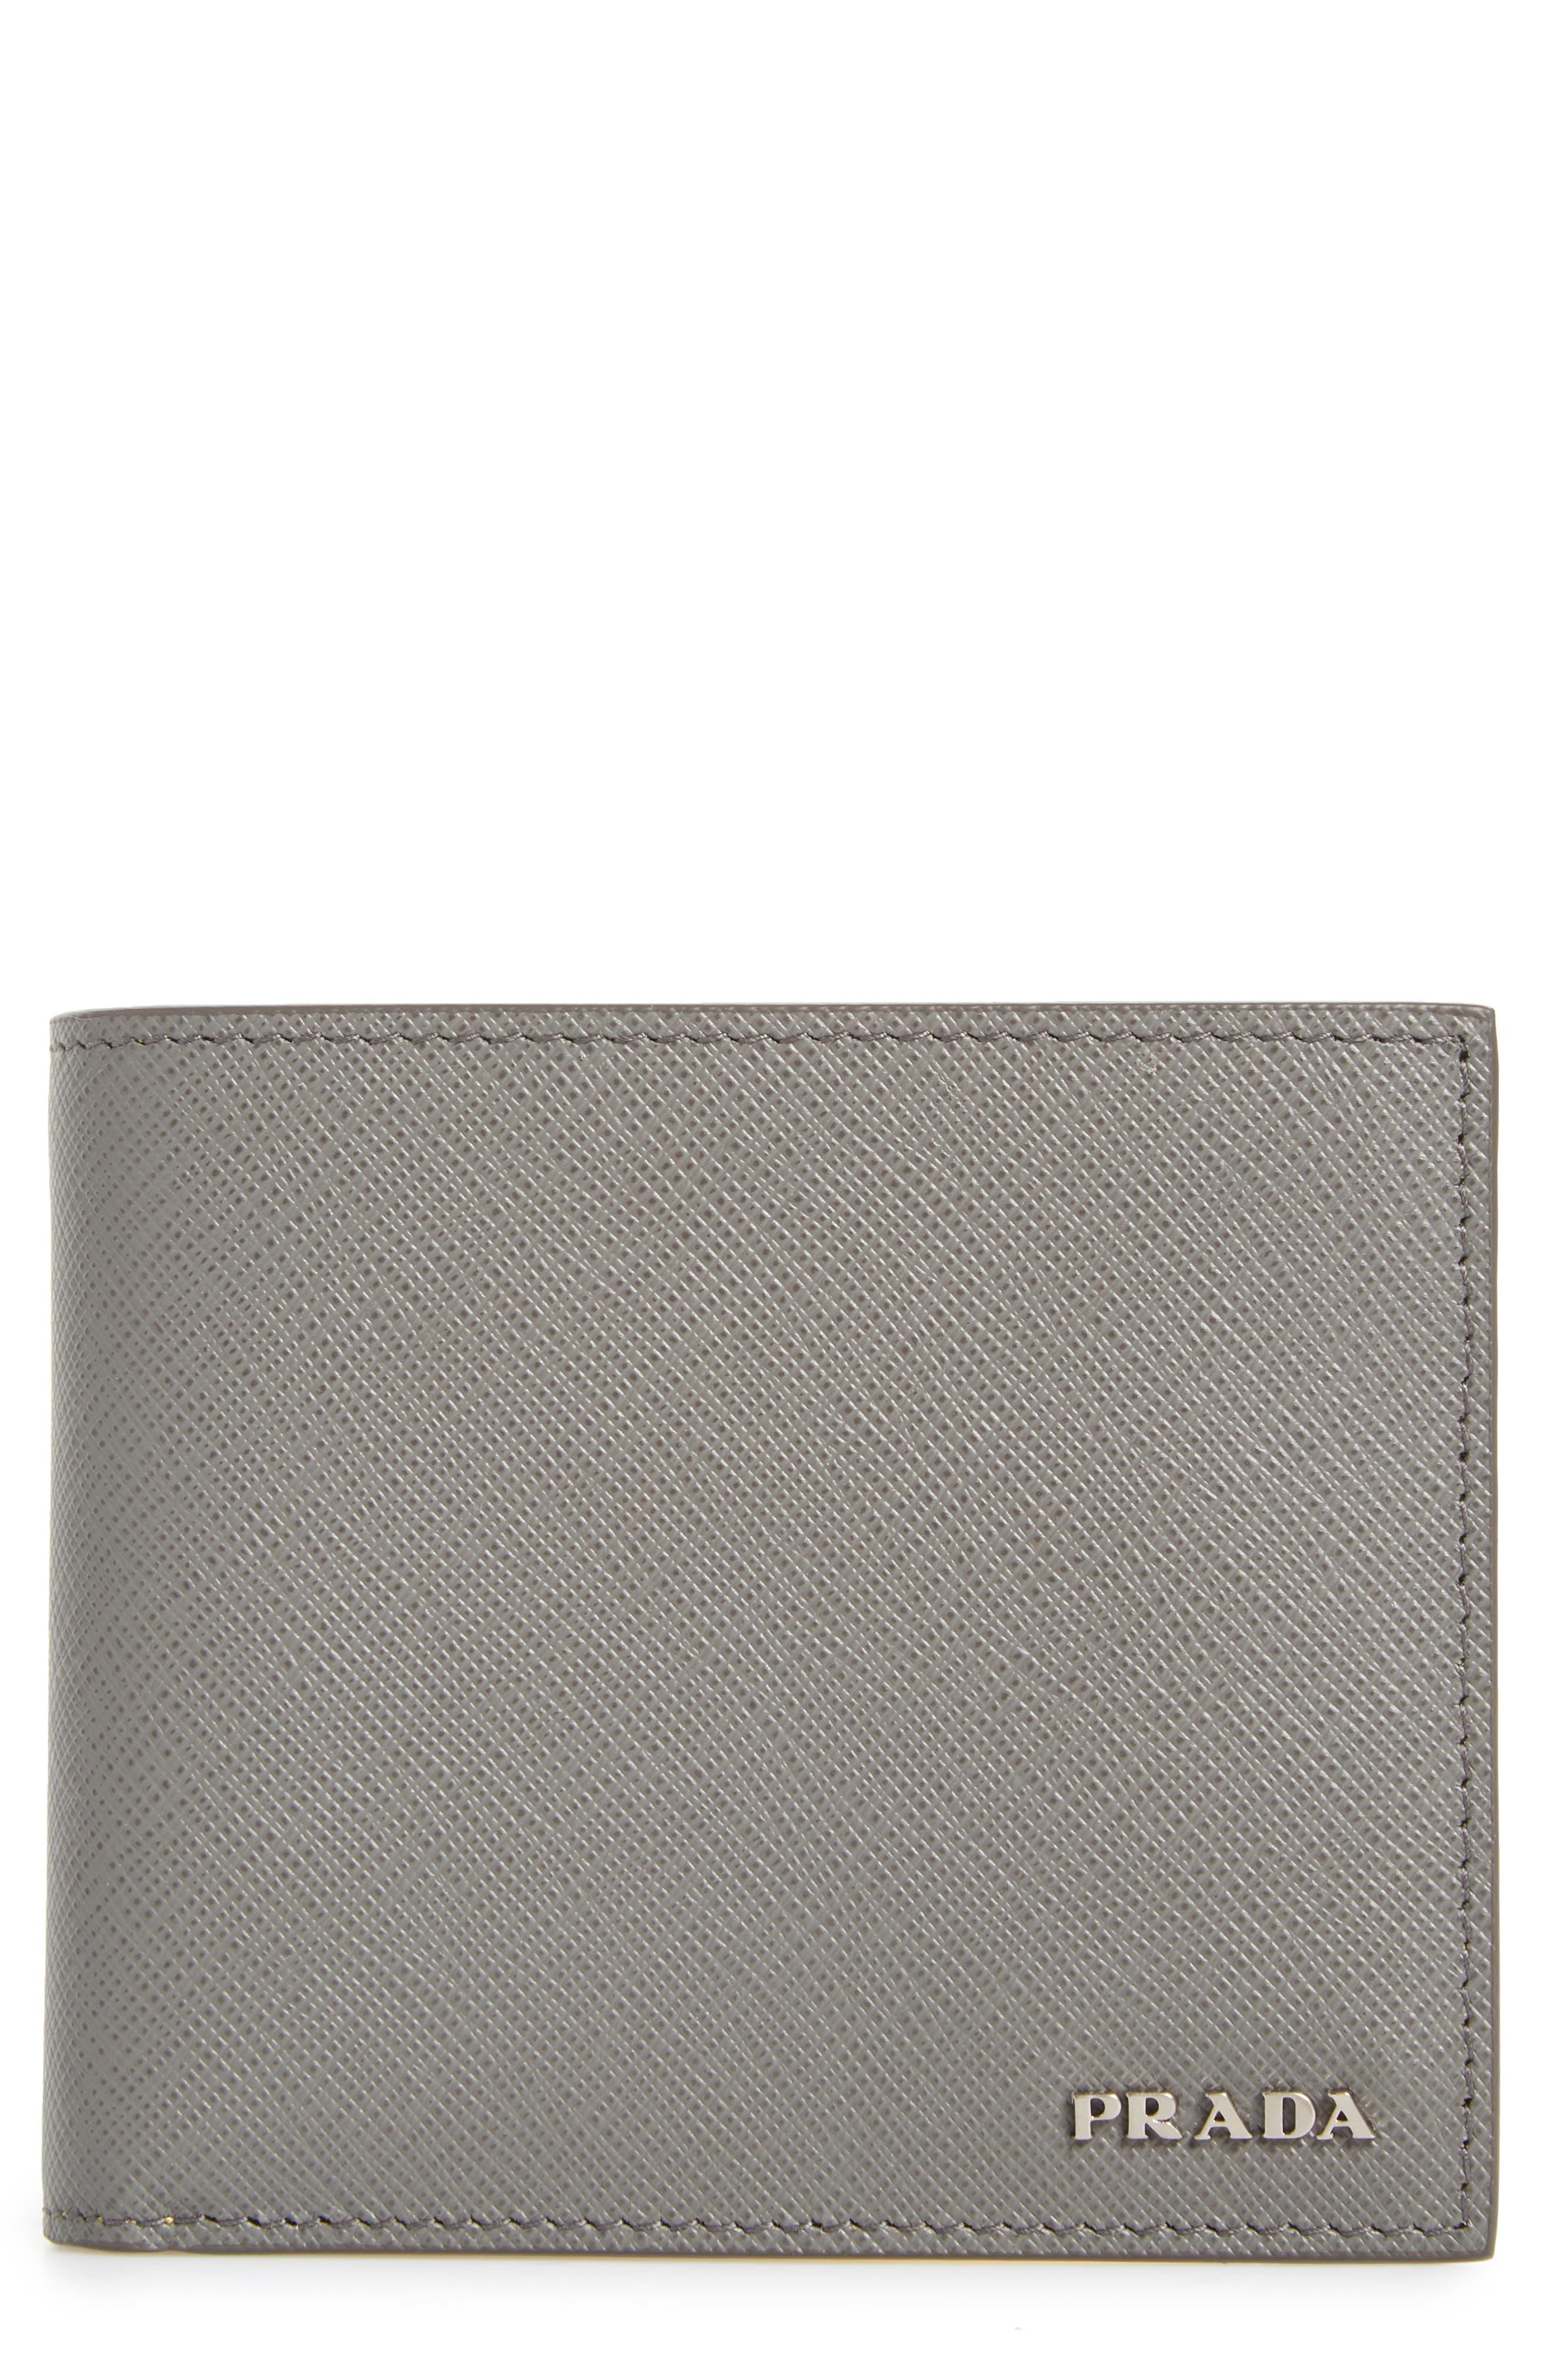 Alternate Image 1 Selected - Prada Bicolor Leather Wallet